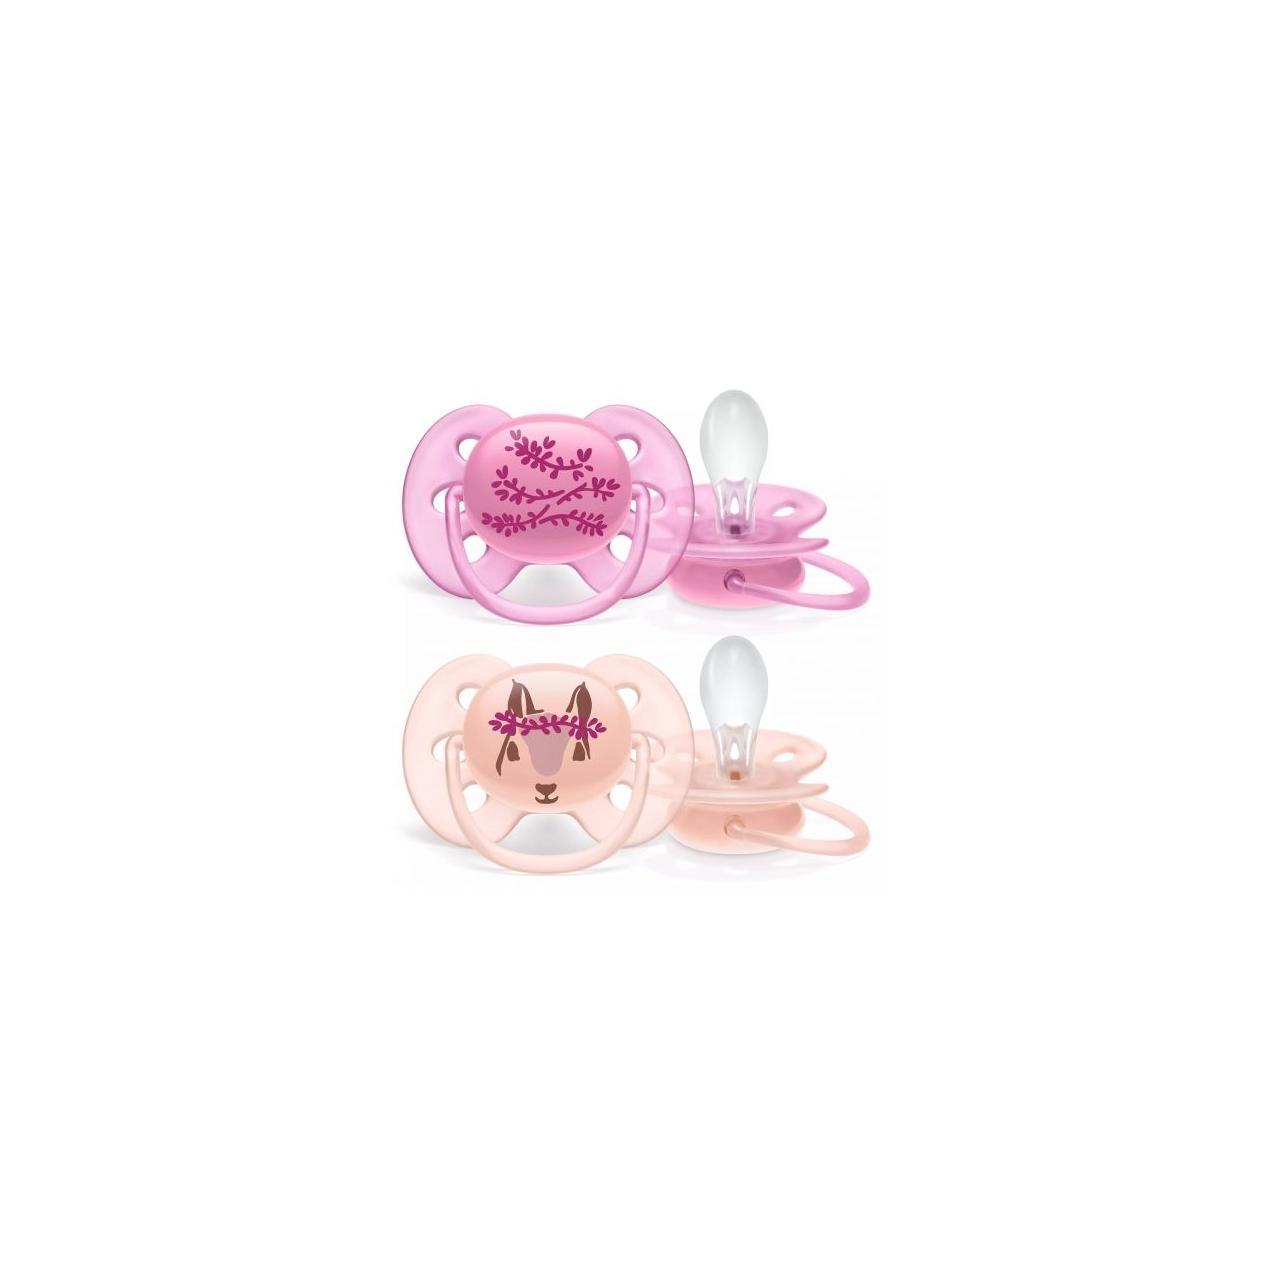 Set 2 suzete Philips-Avent SCF223/04, ultra soft 6-18 luni, Ortodontice, fara BPA, veverita roz